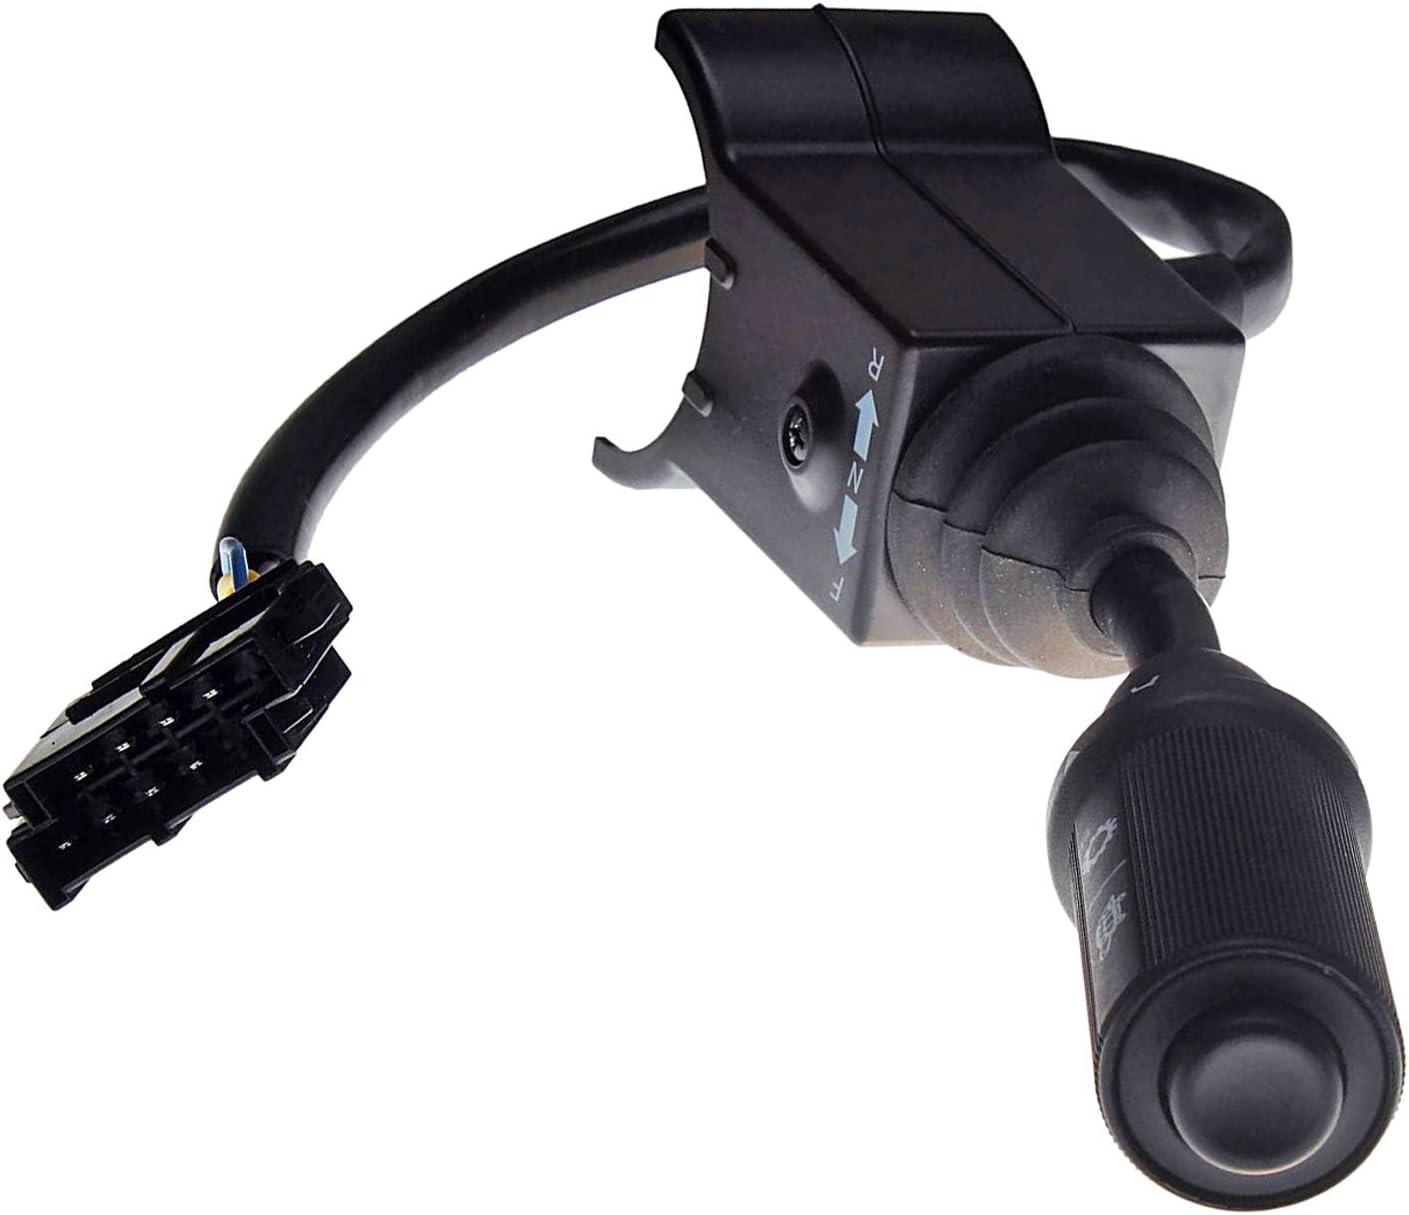 Mover Parts cheap Switch Control Spasm price VOE11039409 for Volvo L120C L90C L70C